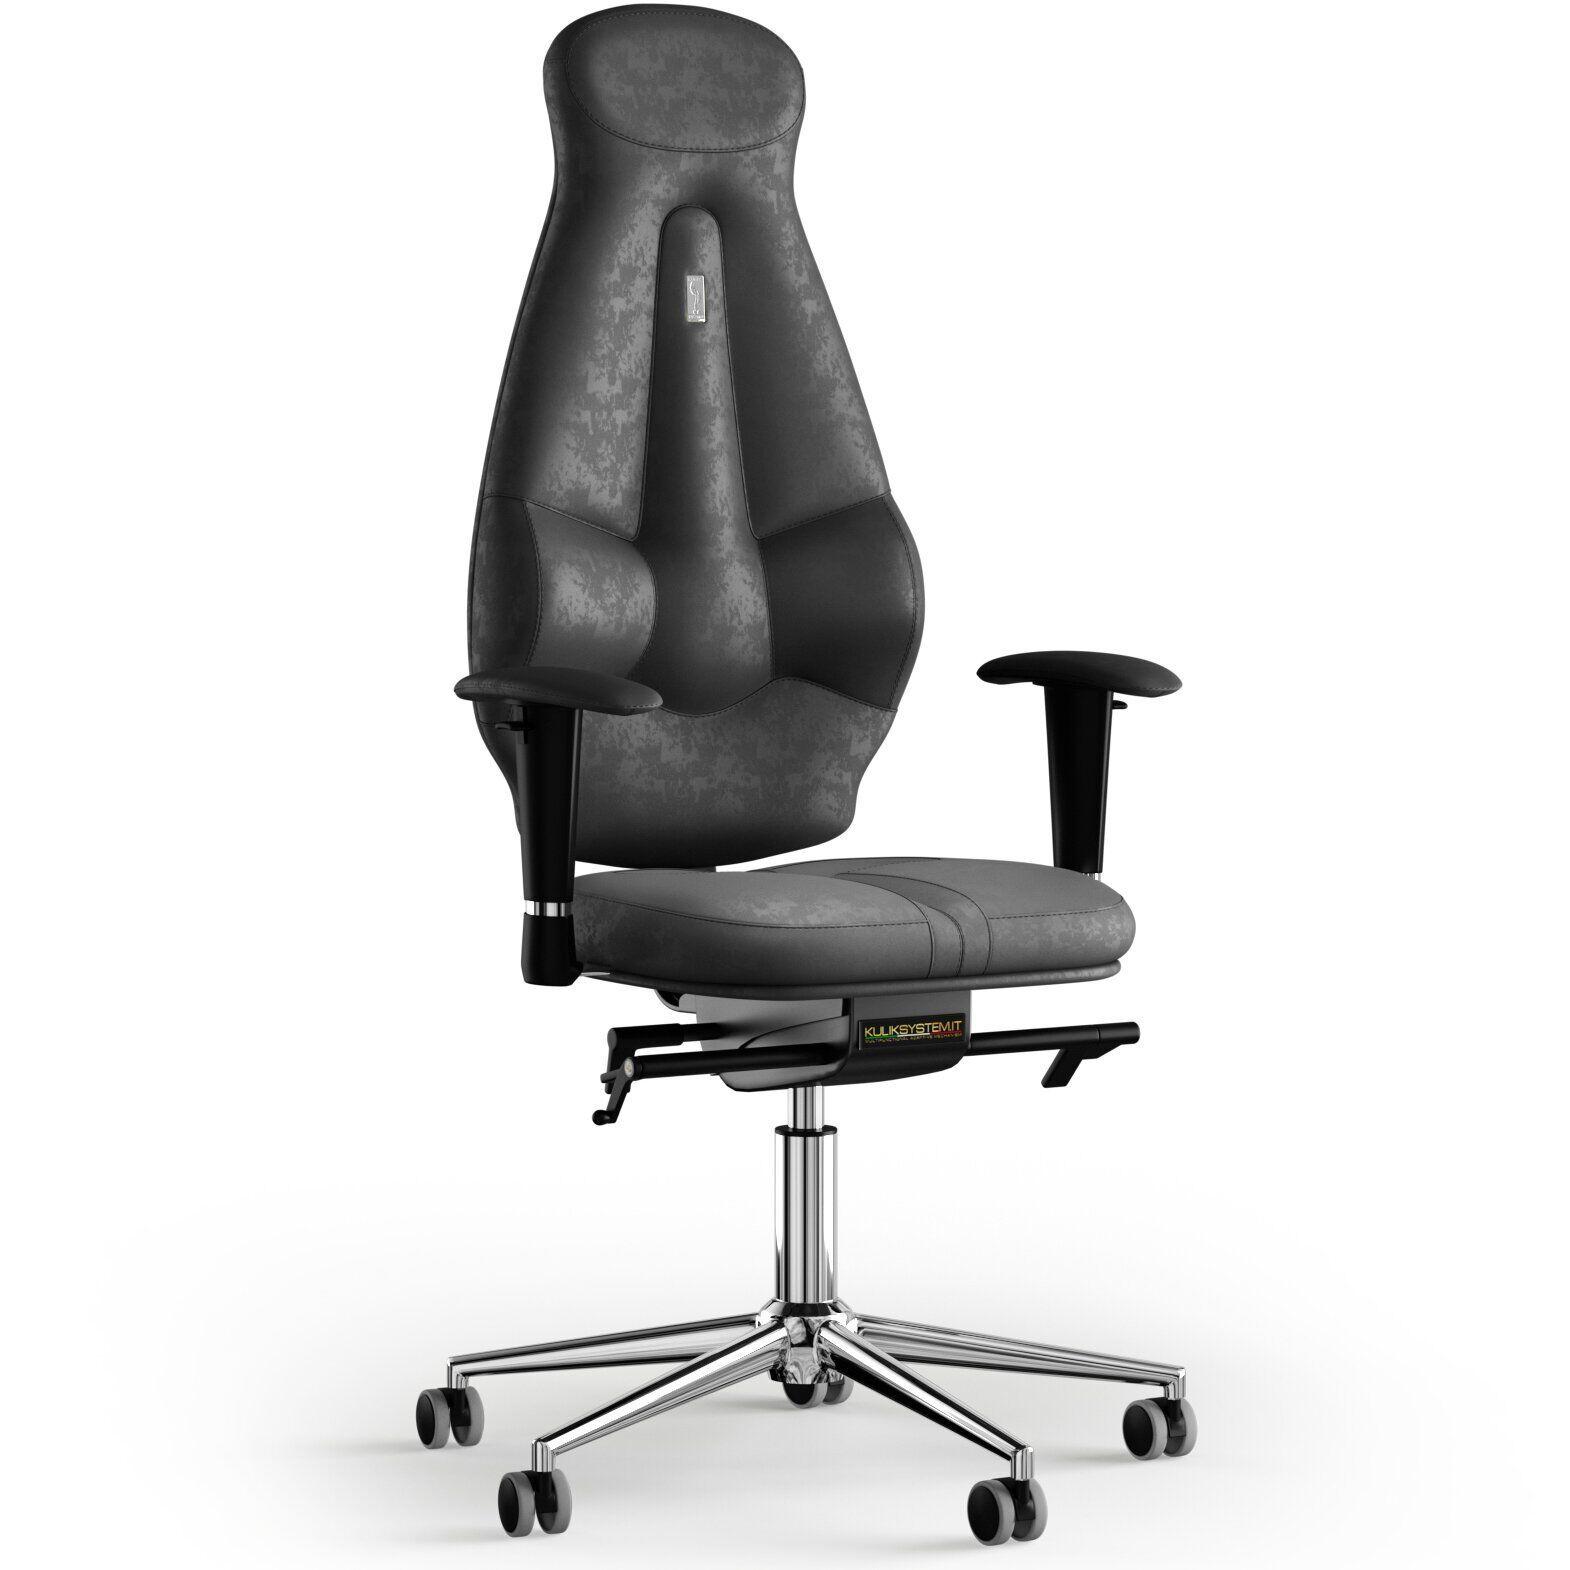 Кресло KULIK SYSTEM GALAXY Антара с подголовником без строчки